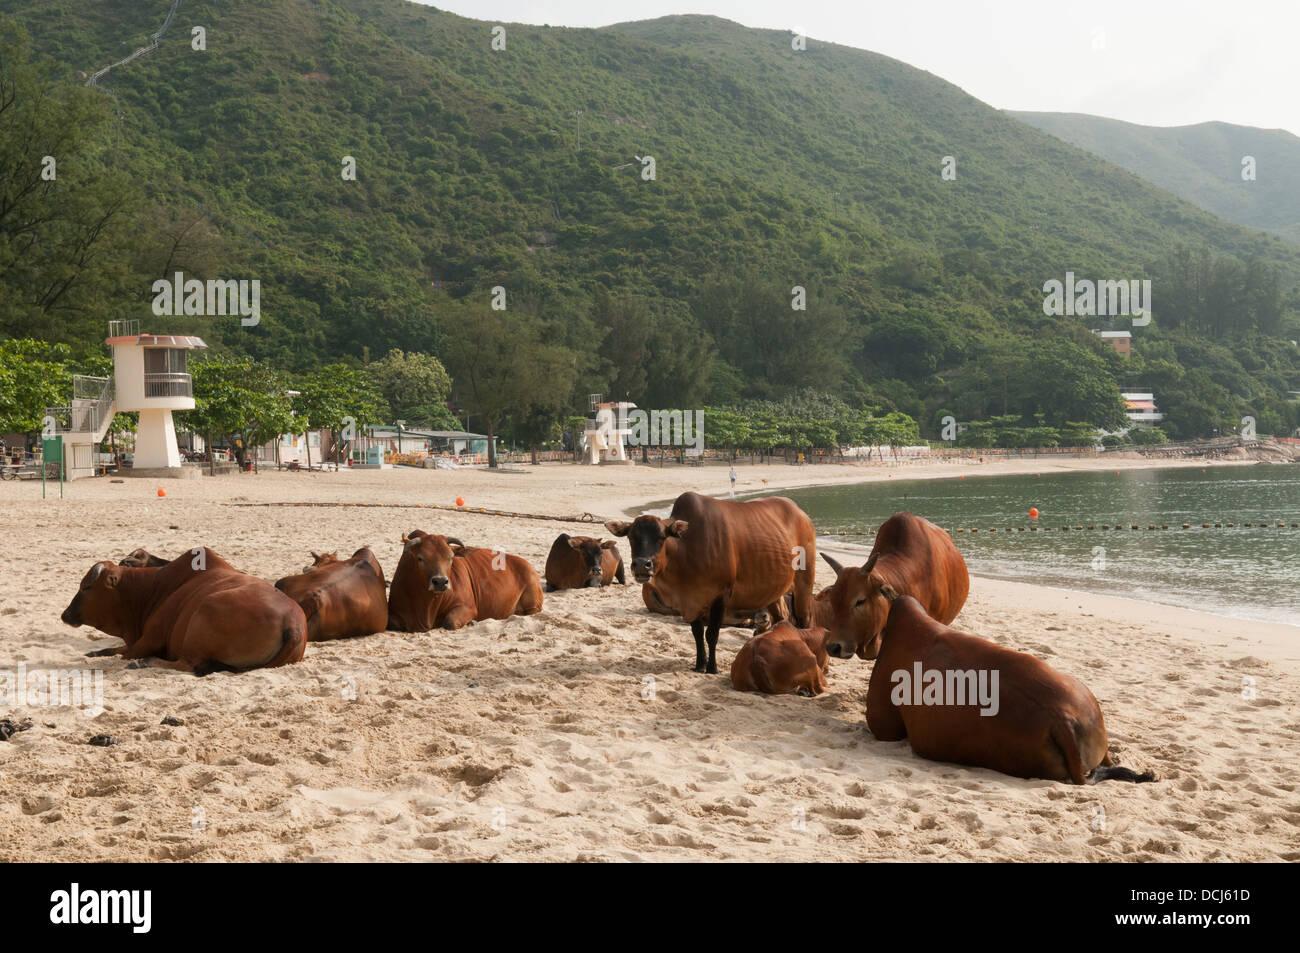 from Francisco mui wo gay beach